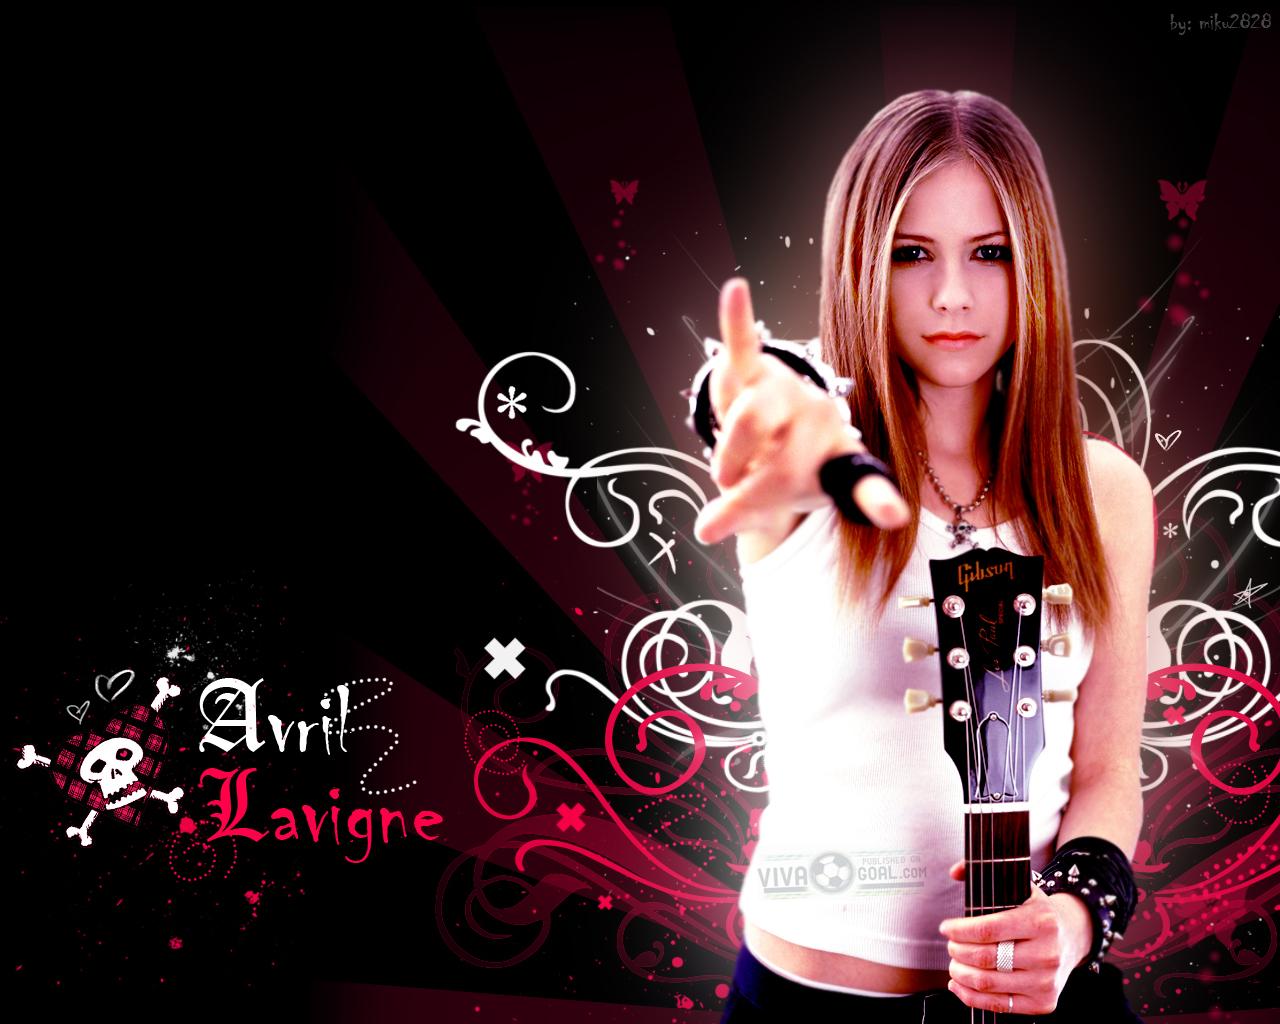 avril lavigne goodbye lullaby rar free download